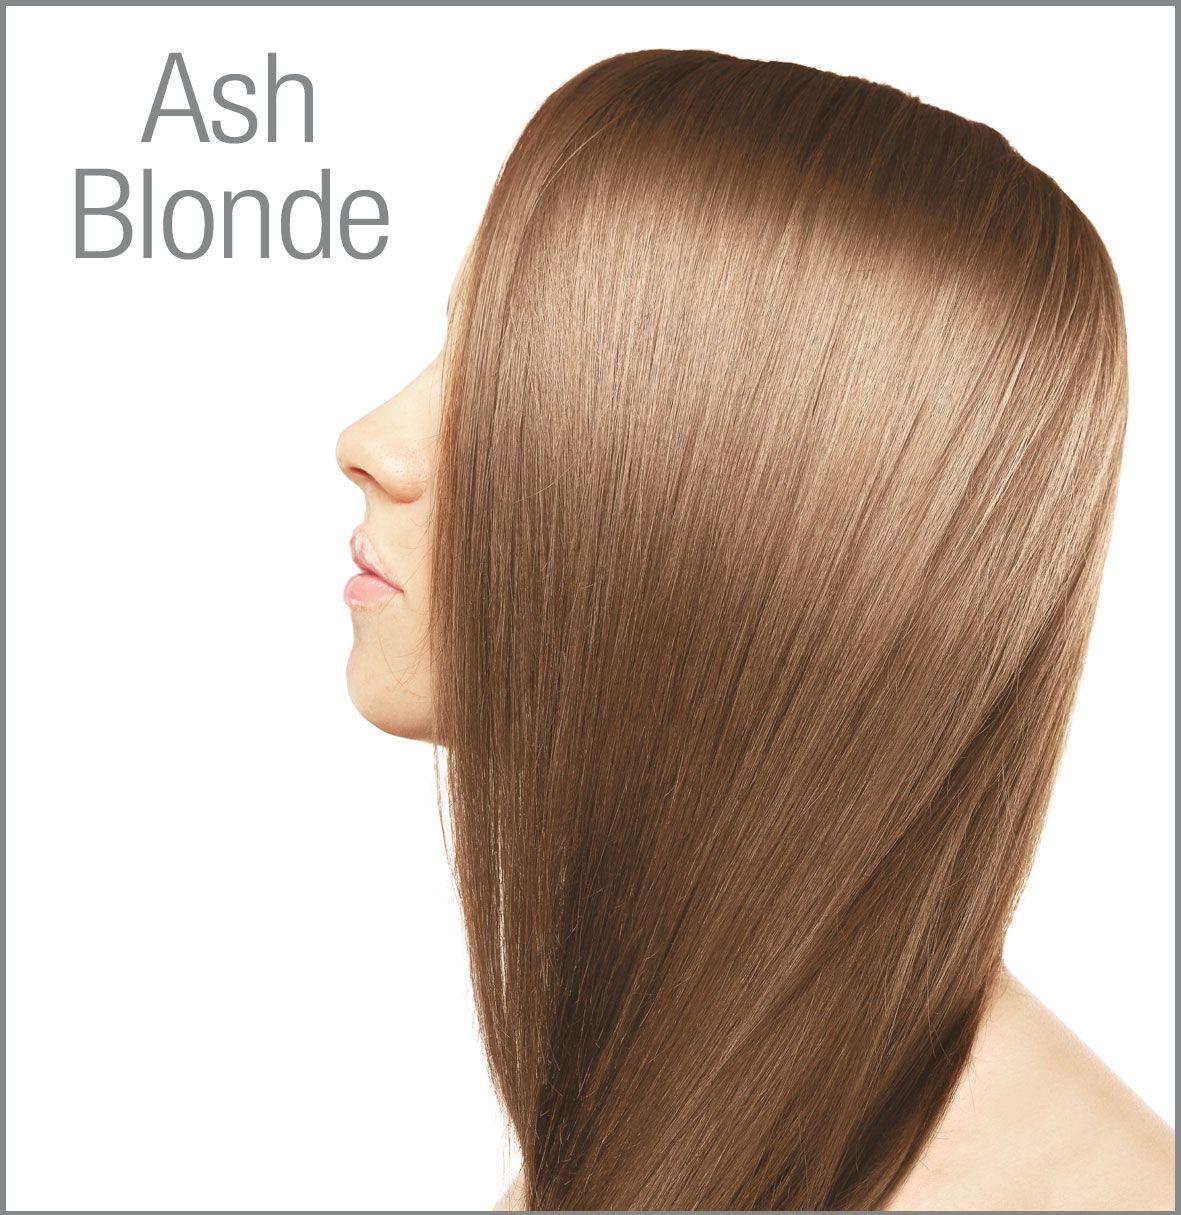 SURYA HENNA CREAM ASH BLONDE 70 ml | Hair | Pinterest ...